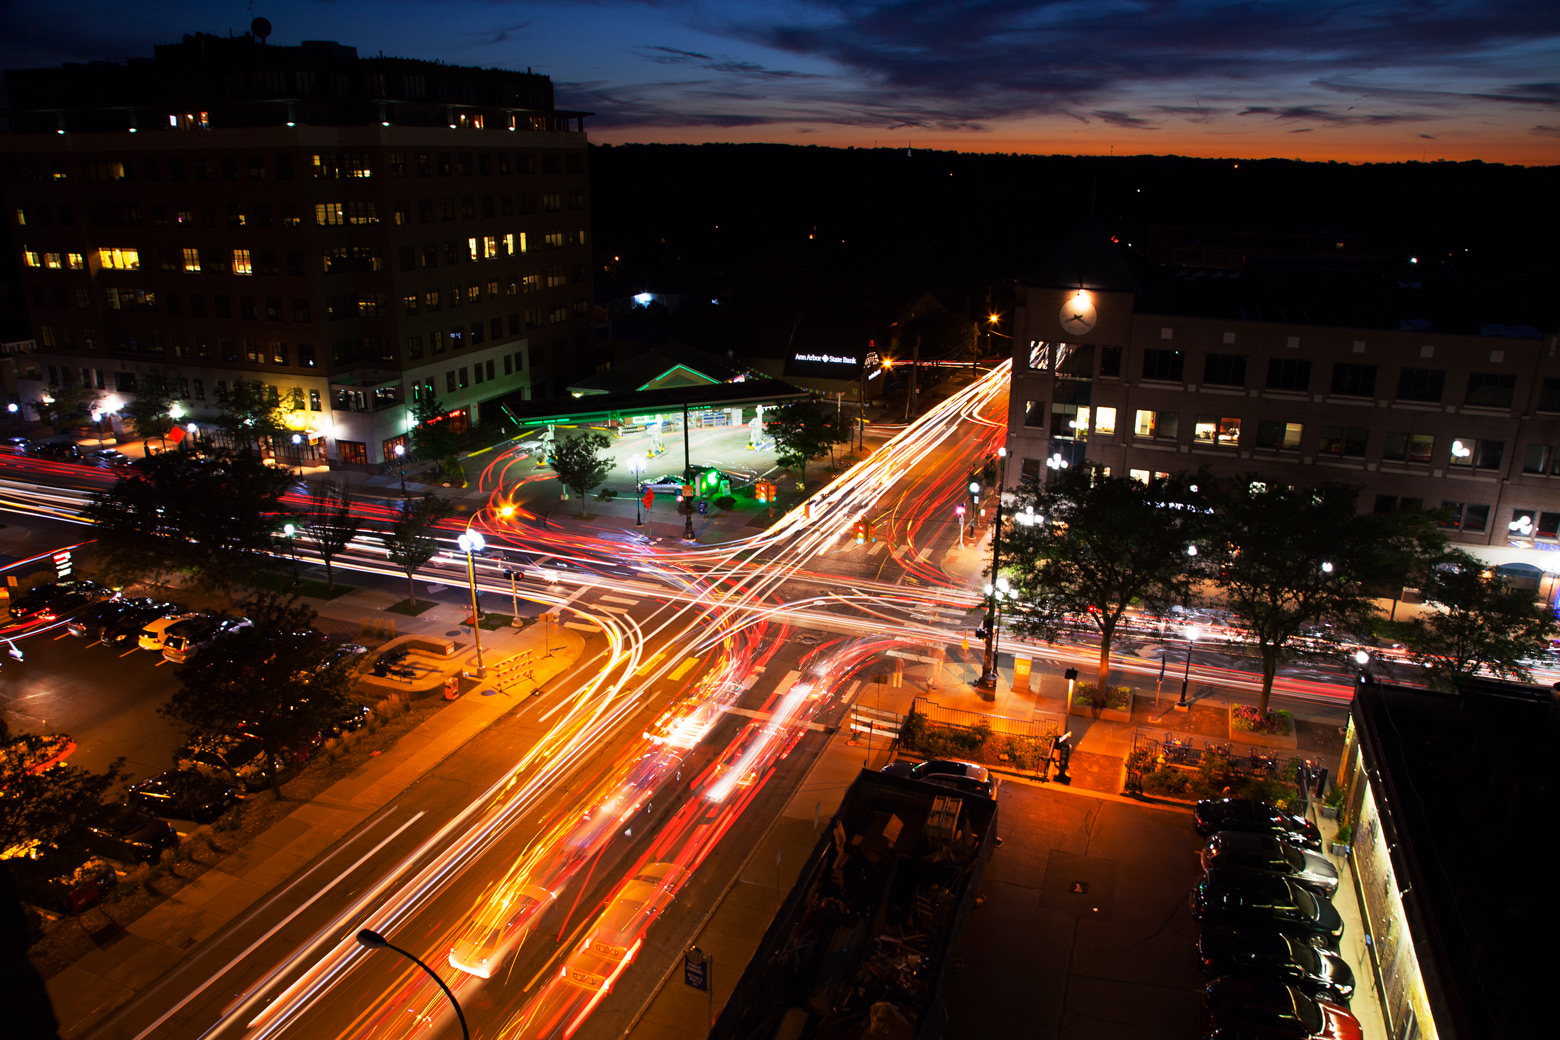 An Ann Arbor intersection. Image credit: Marcin Szczepanski, Michigan Engineering